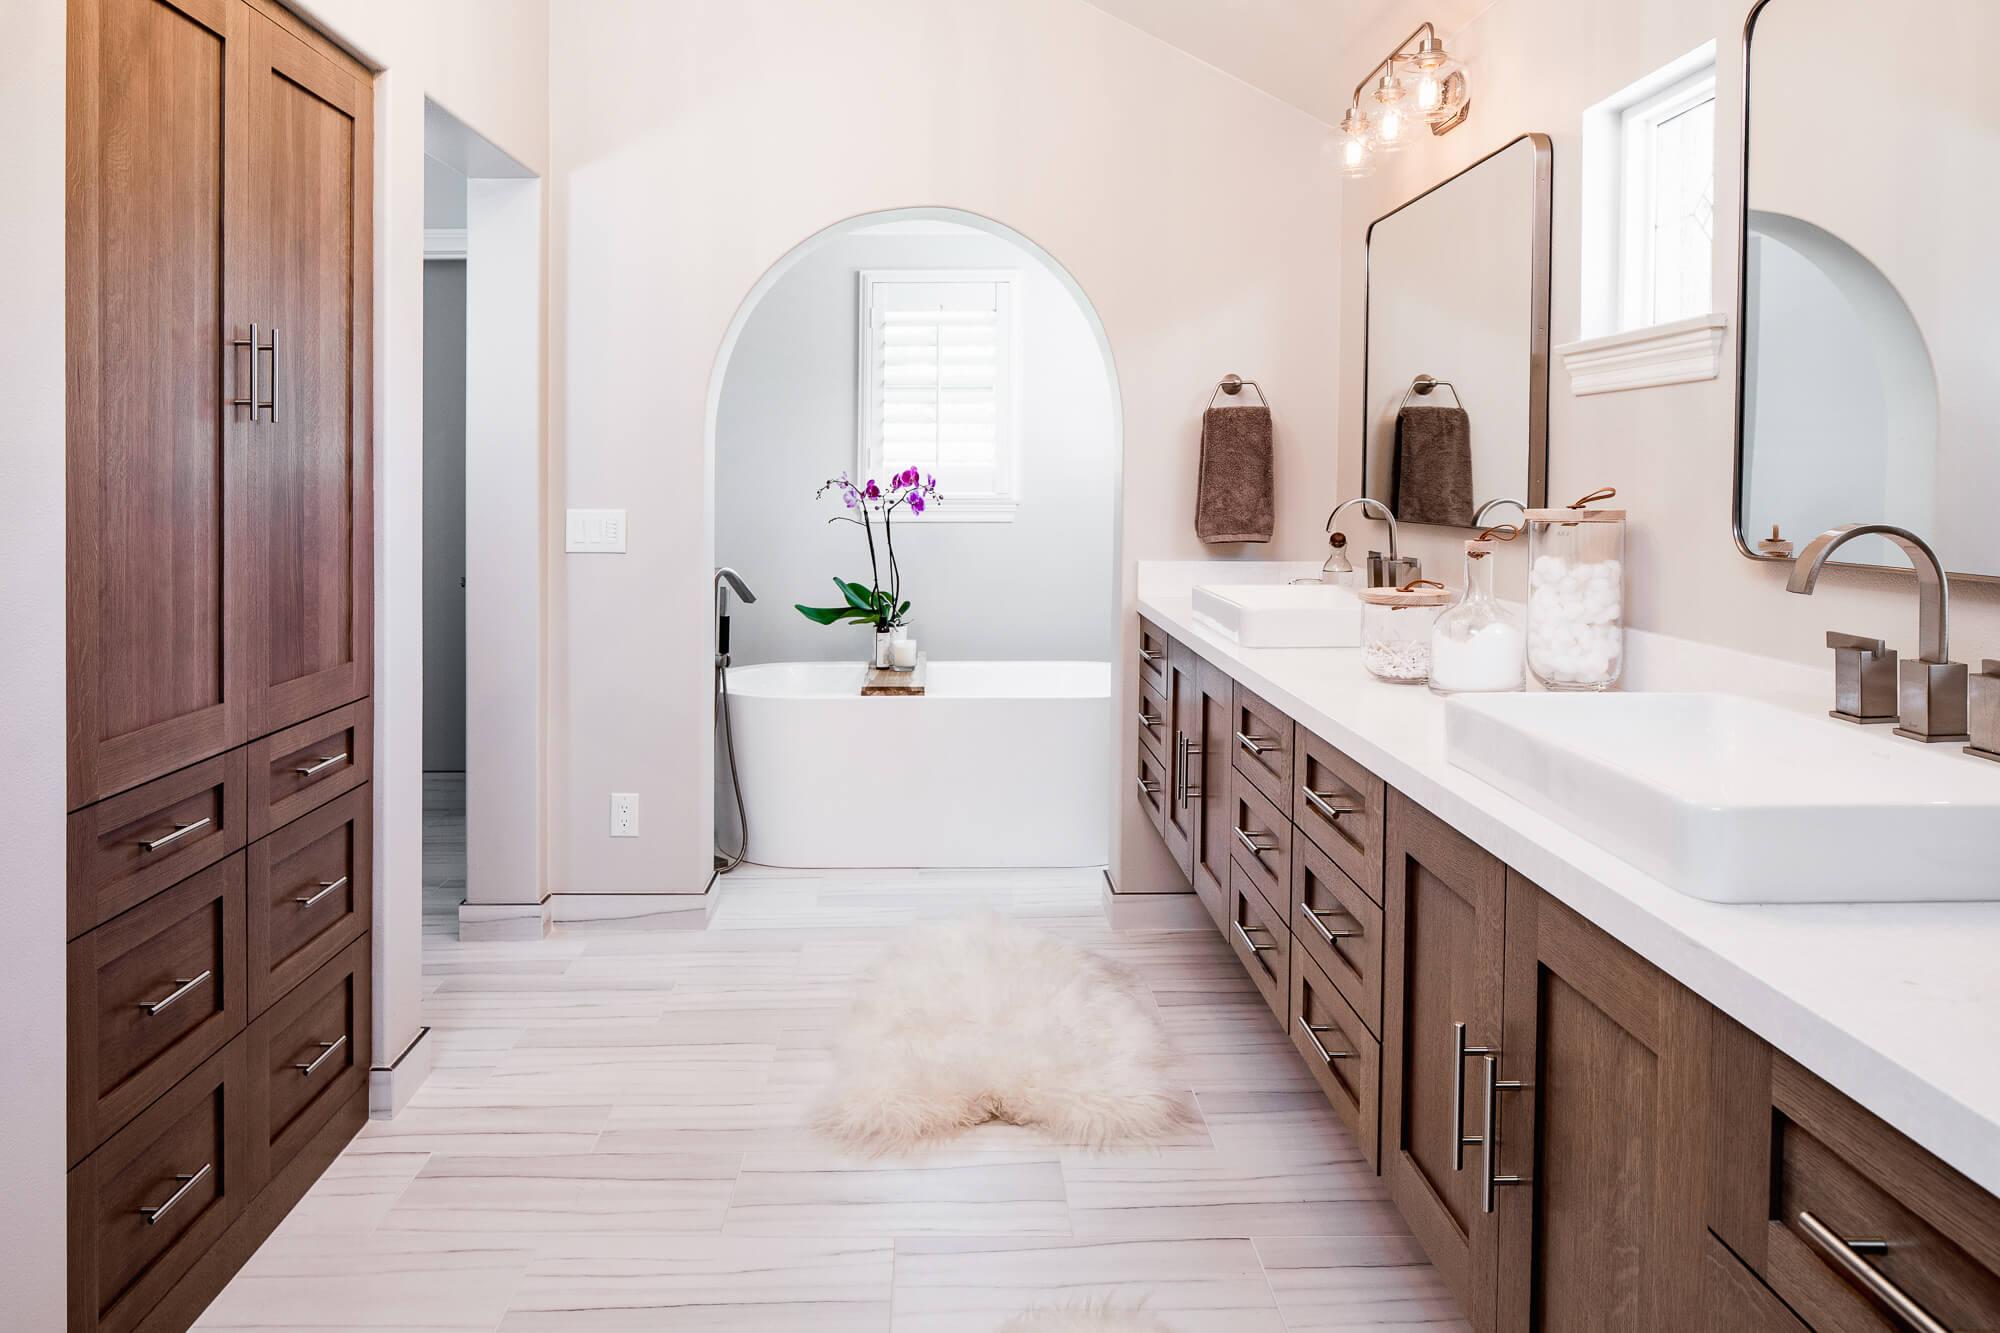 Custom Bathroom Cabinetry – Storage & Organization Design Guide